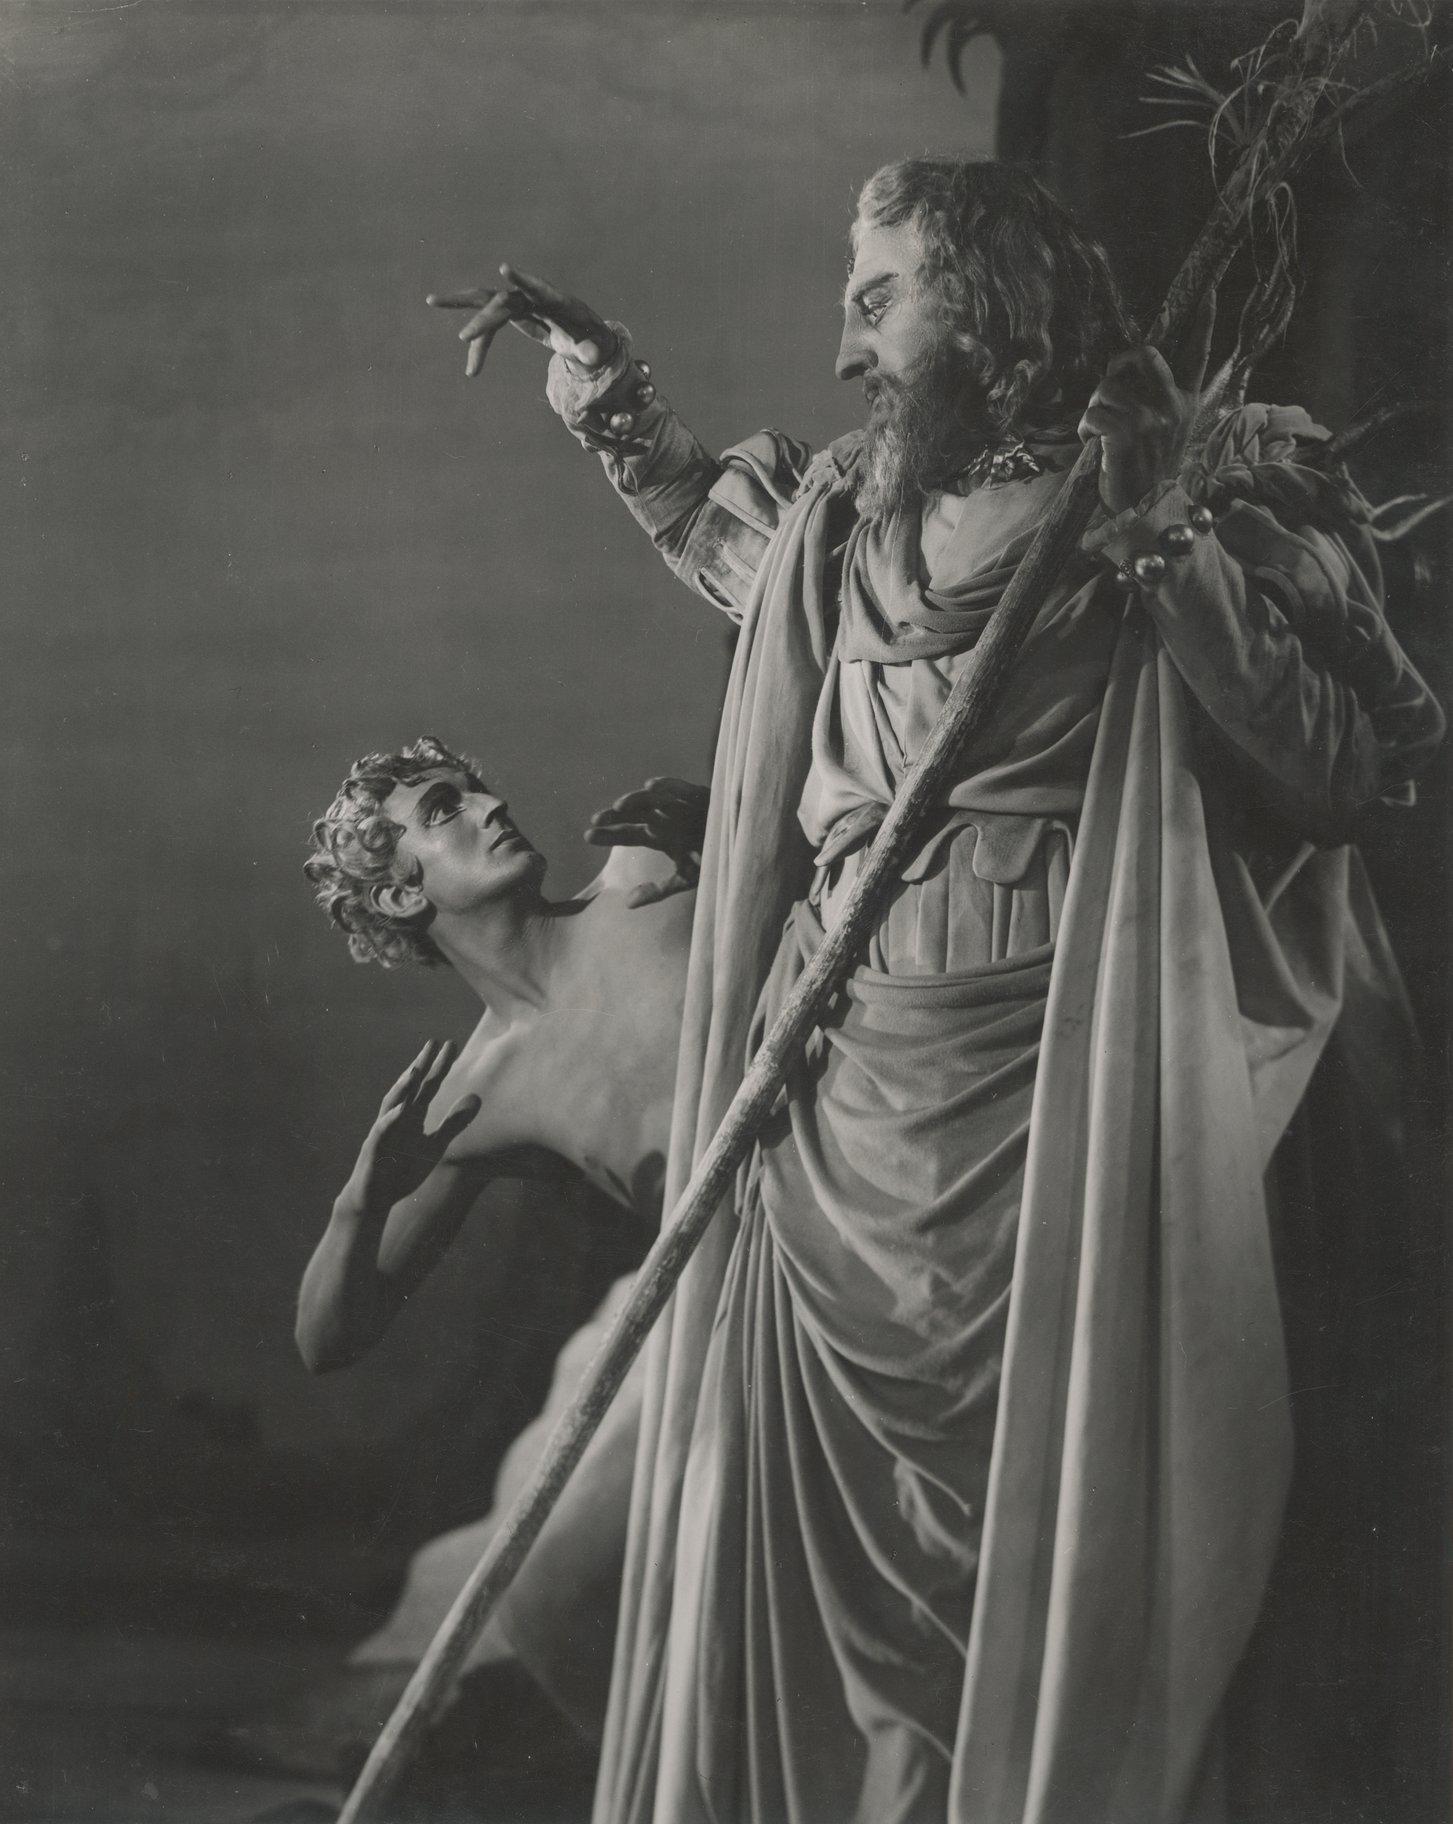 Prospero stands over Ariel.